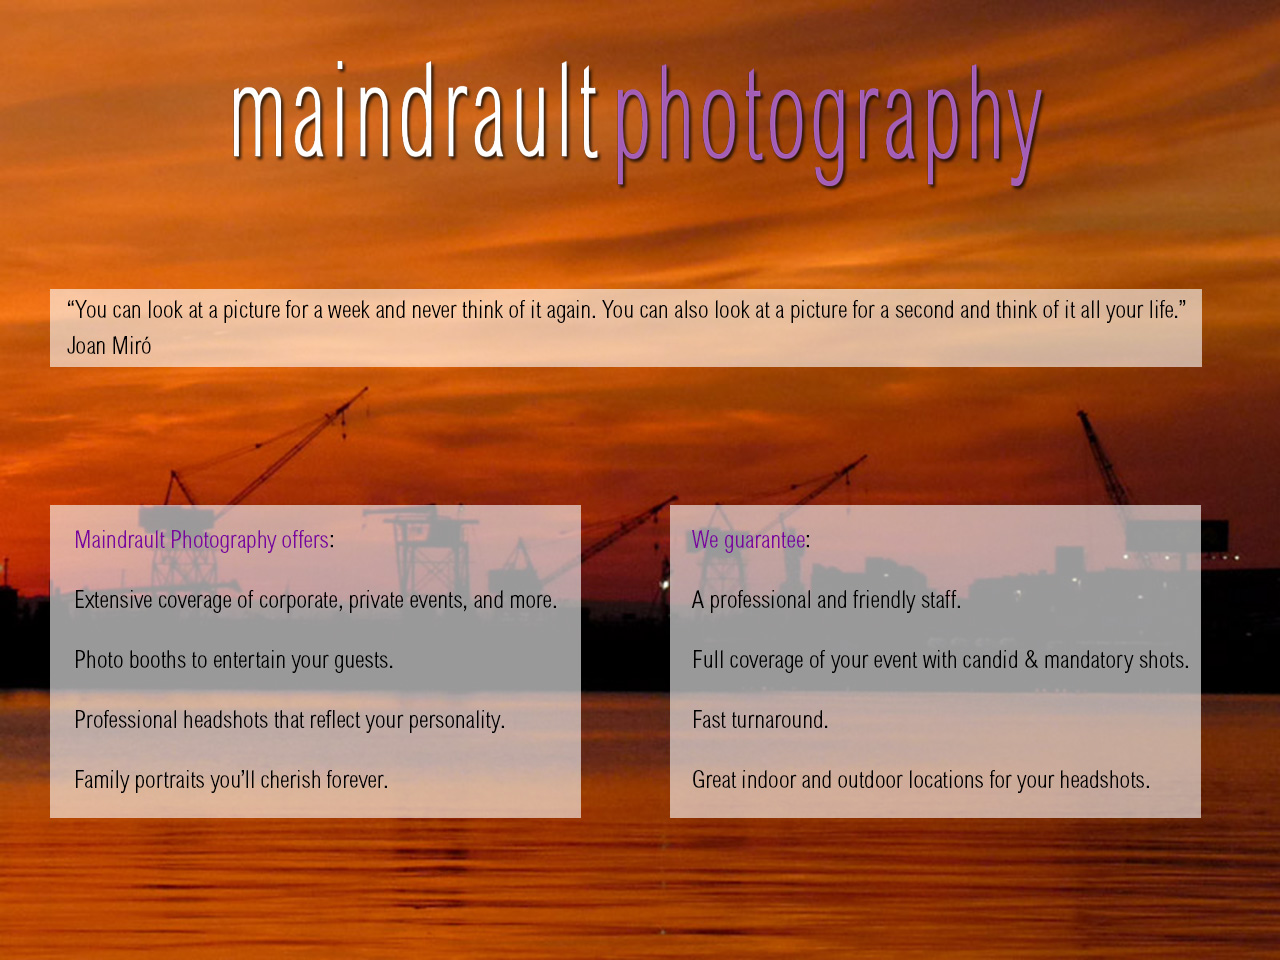 Maindrault Photography – Headshots, portraits and event